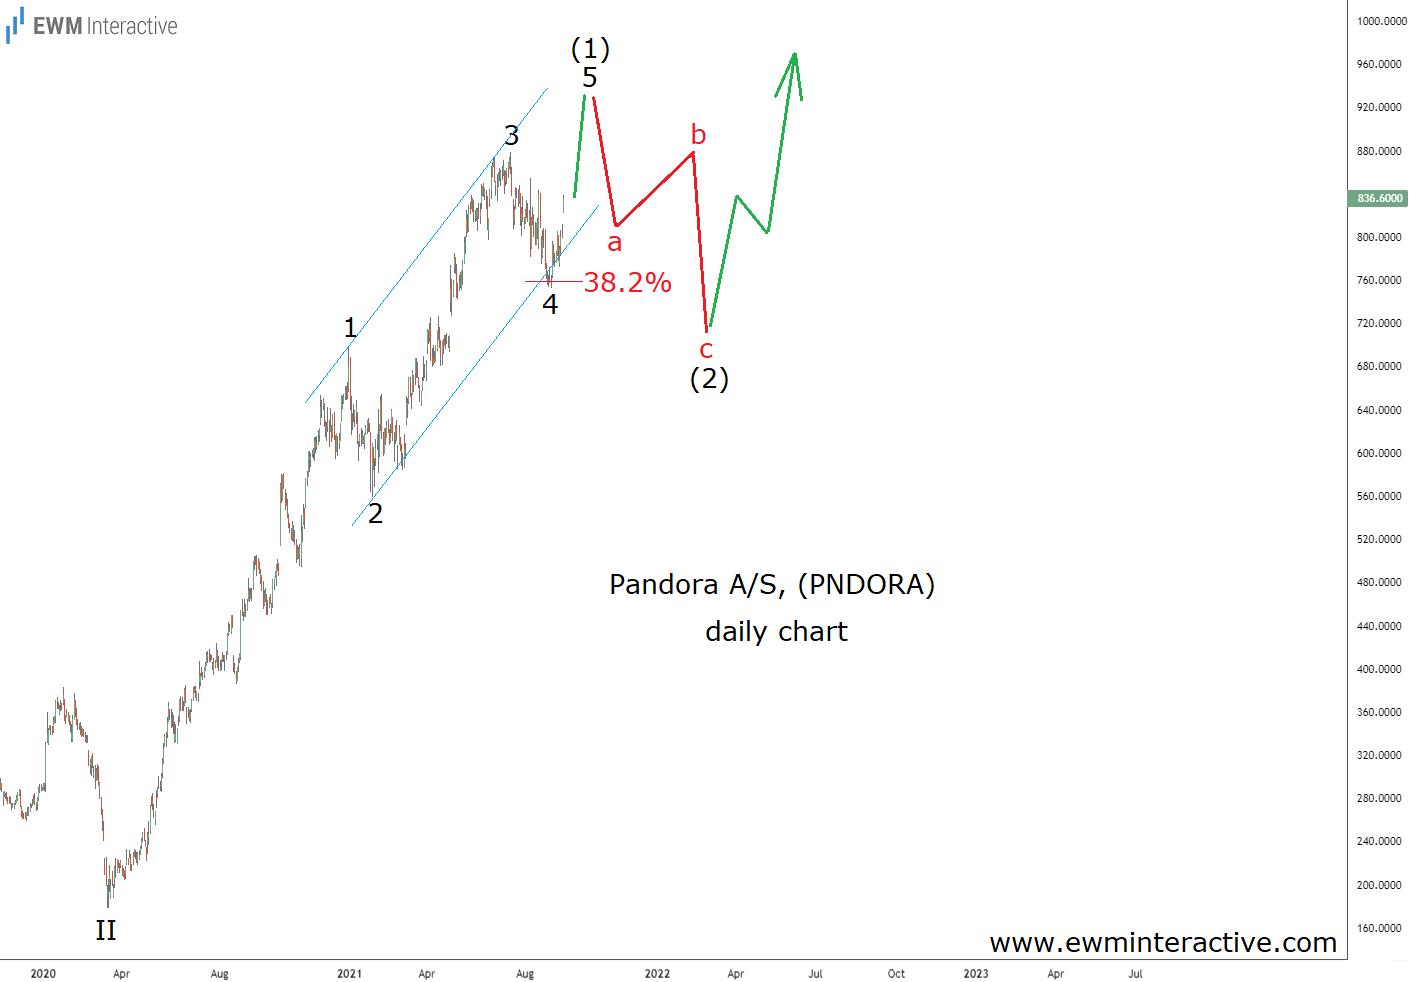 Pandora completes impulsive pandemic recovery